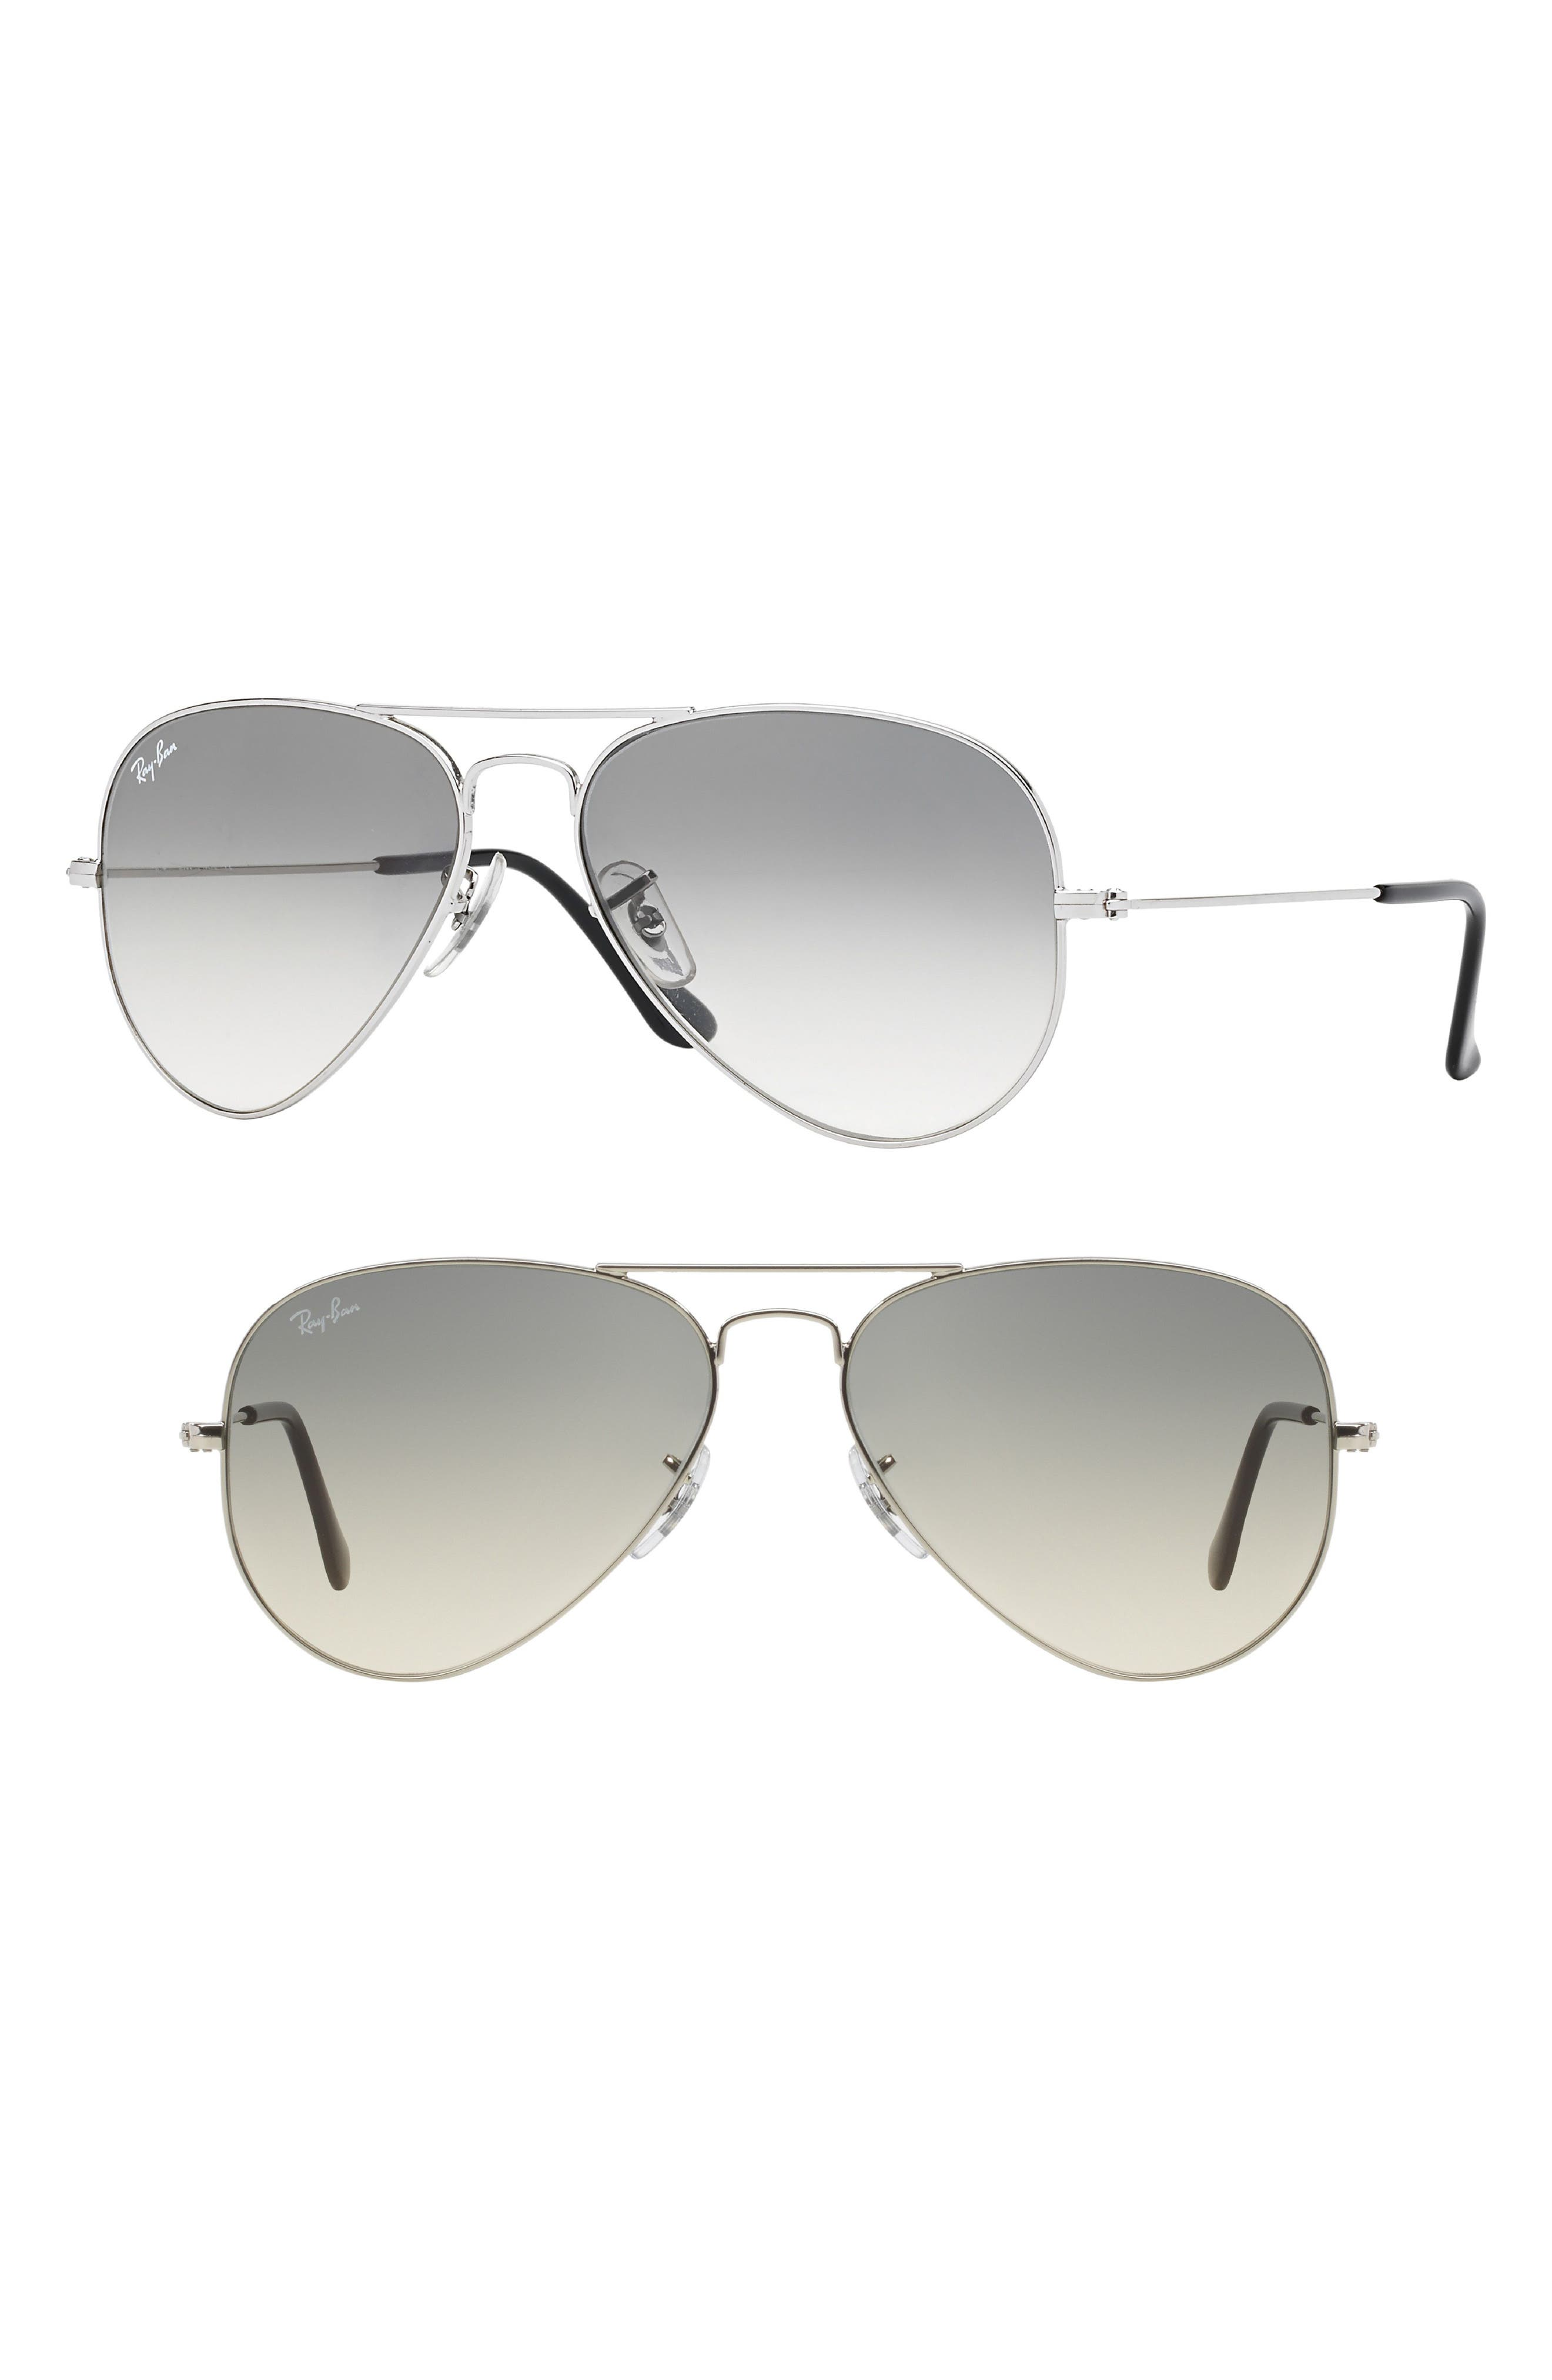 Standard Original 58mm Aviator Sunglasses,                             Alternate thumbnail 2, color,                             050